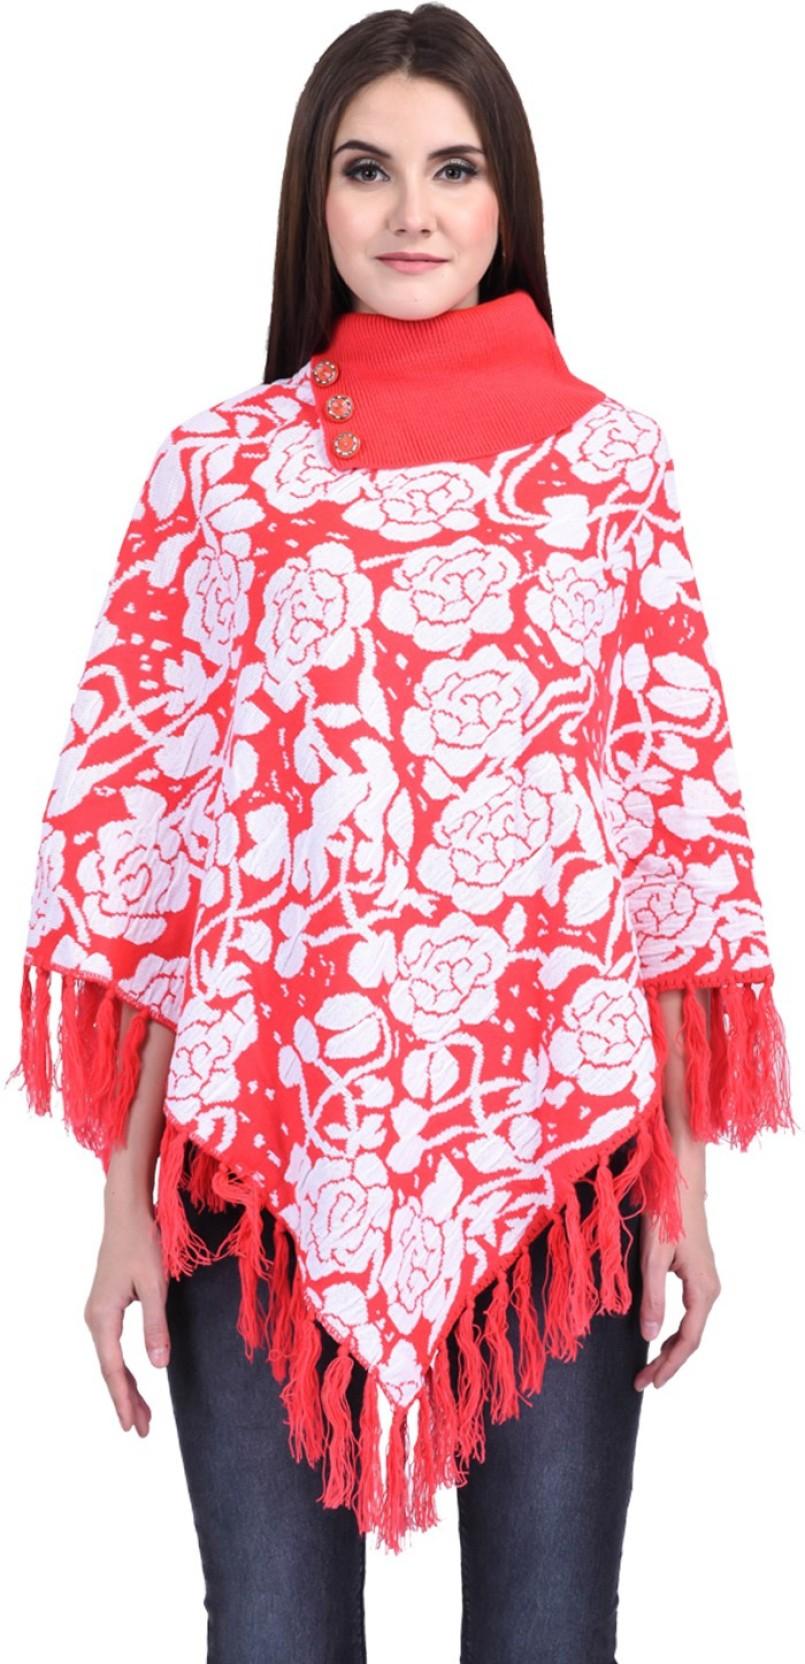 0baf96f9383 eCools Women Ladies Girls Winter wear Woolen Poncho - Buy eCools ...